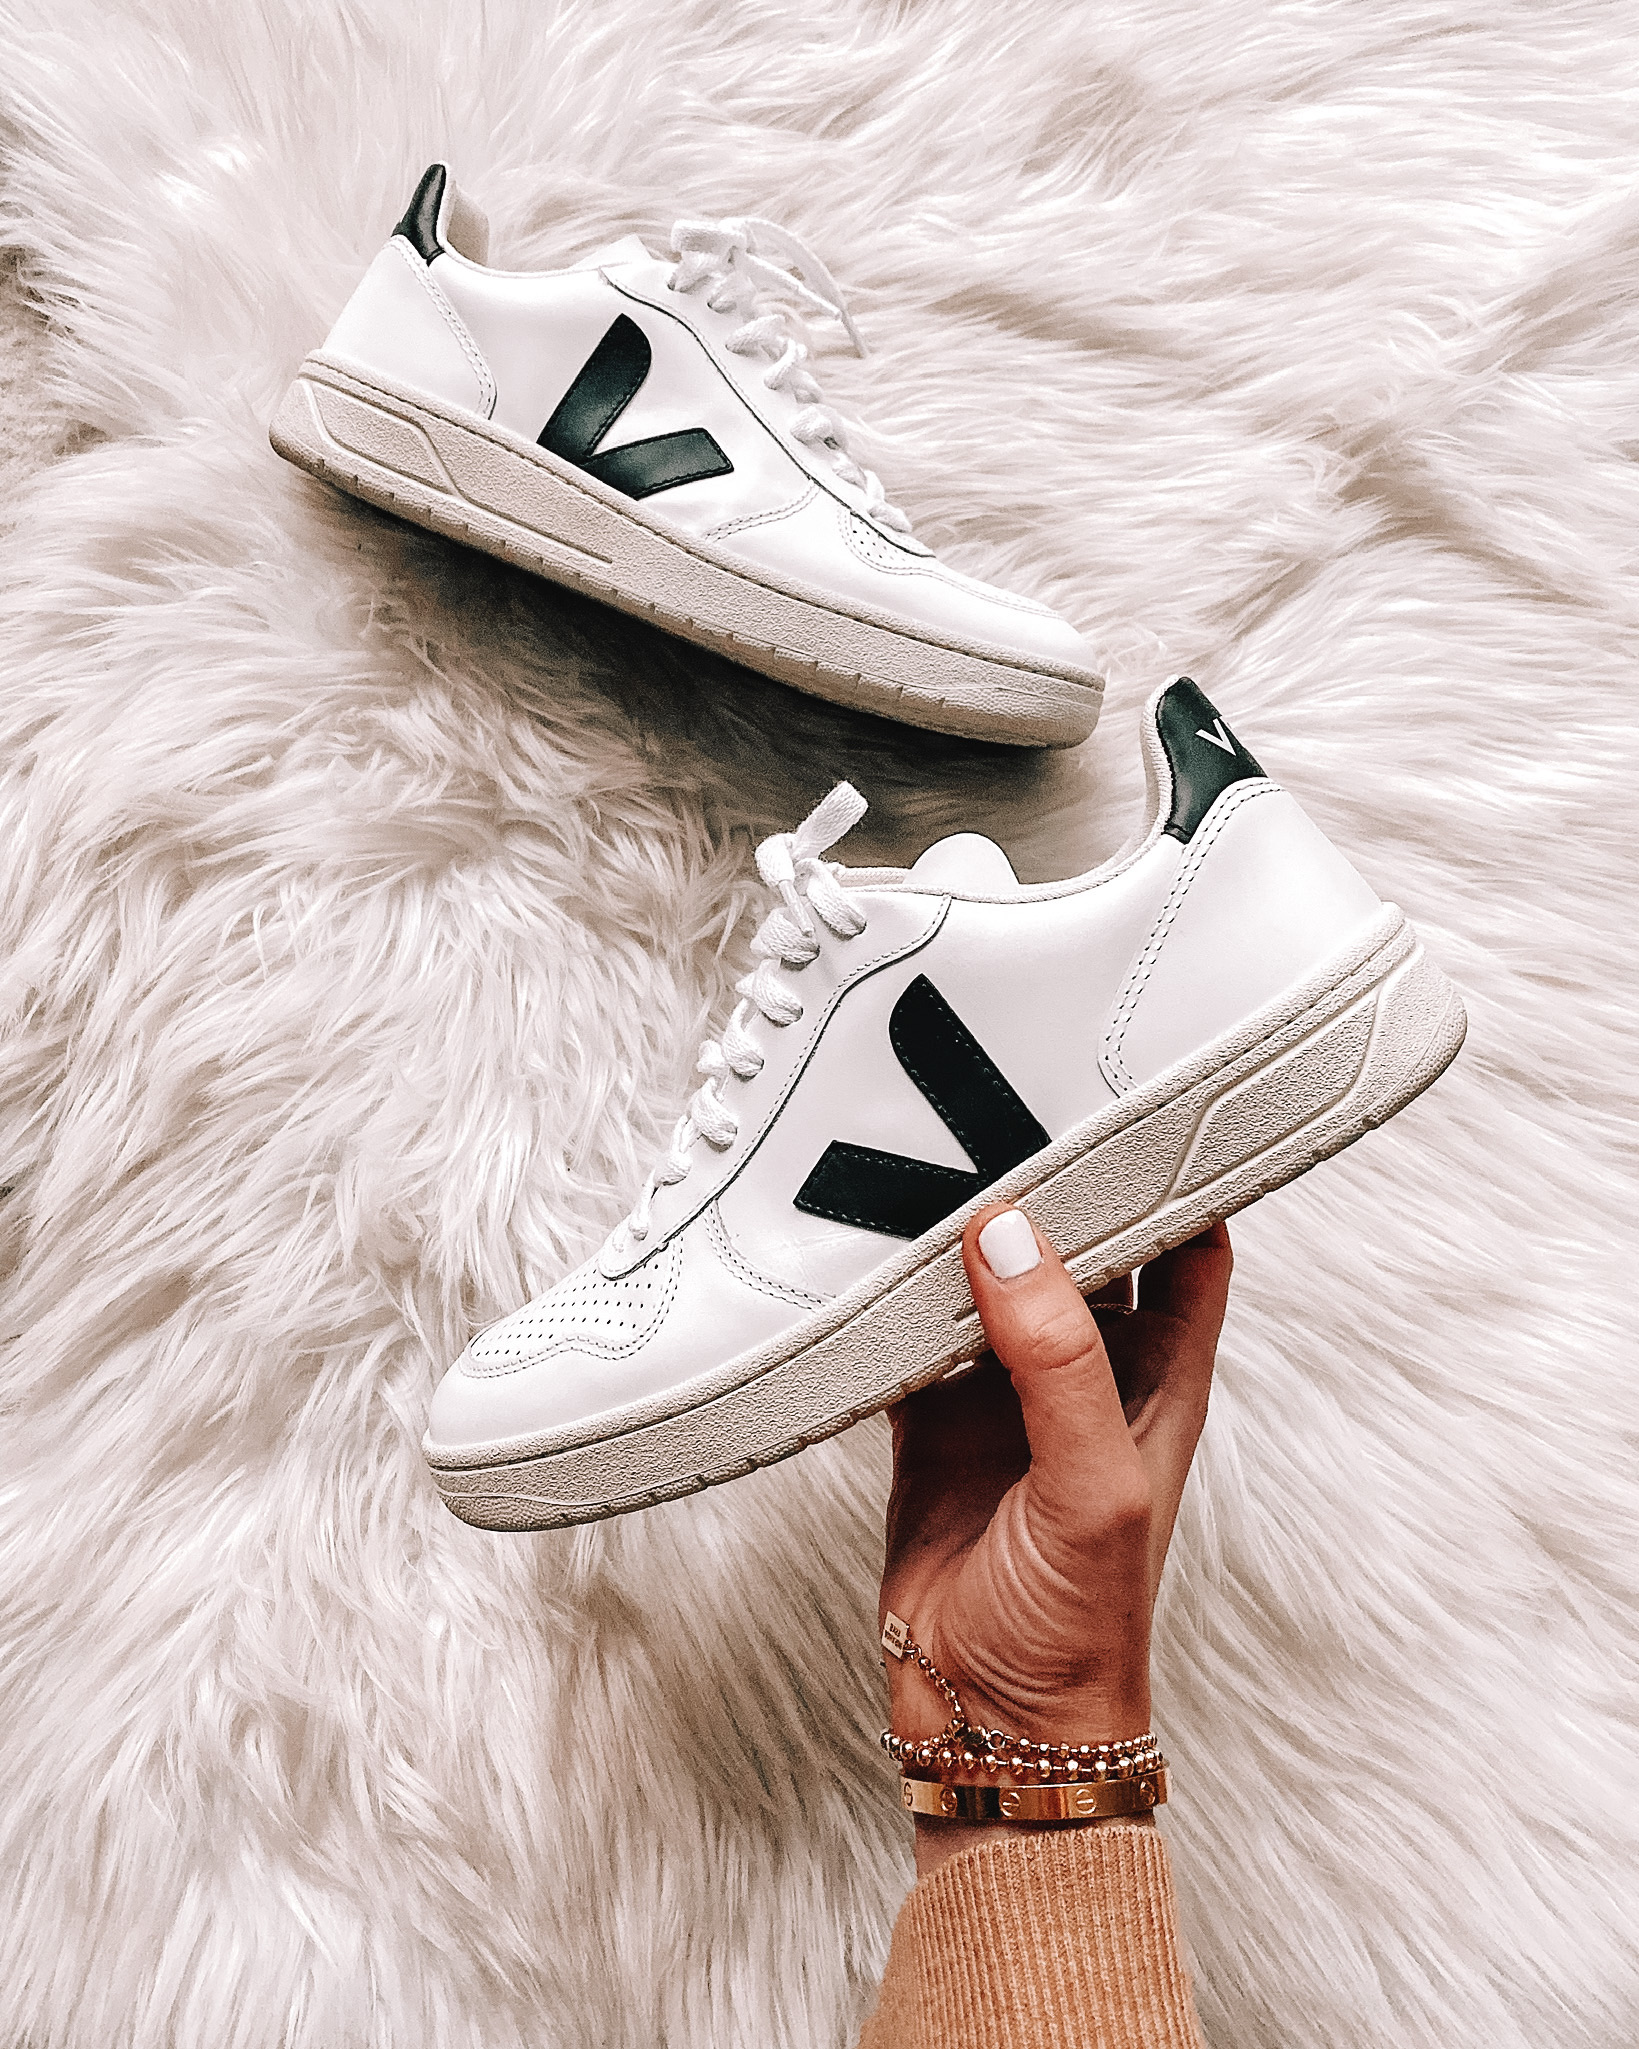 aprobar Manuscrito Perca  Veja V10 Sneaker Review and Esplar Comparison | Fashion Jackson